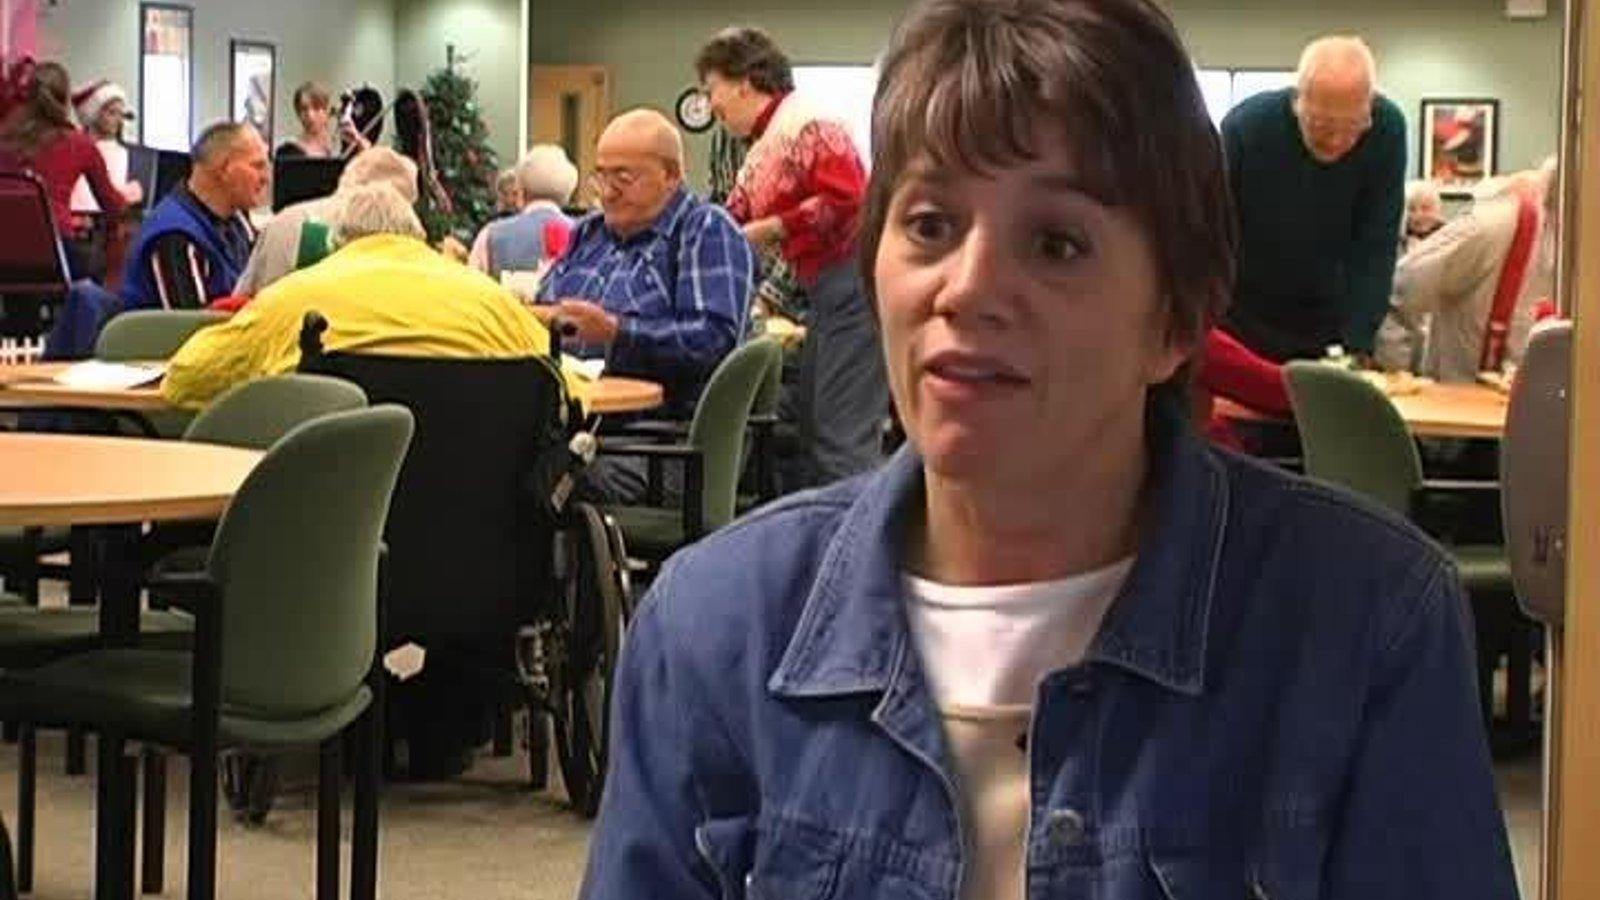 Getting Around - Alternatives for Seniors Who No Longer Drive